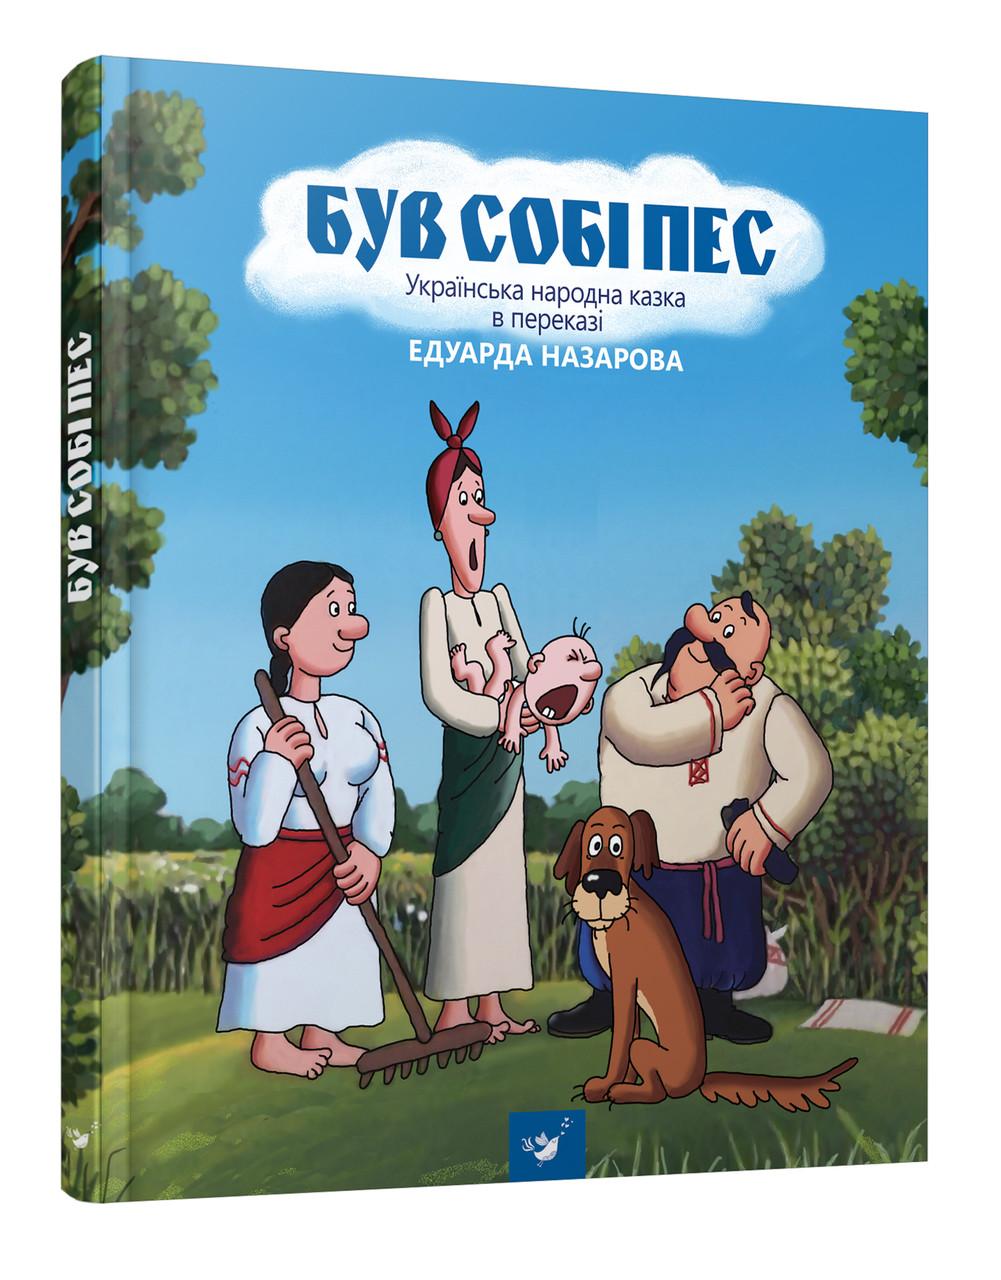 Книга для детей Був собі пес Едуард Назаров